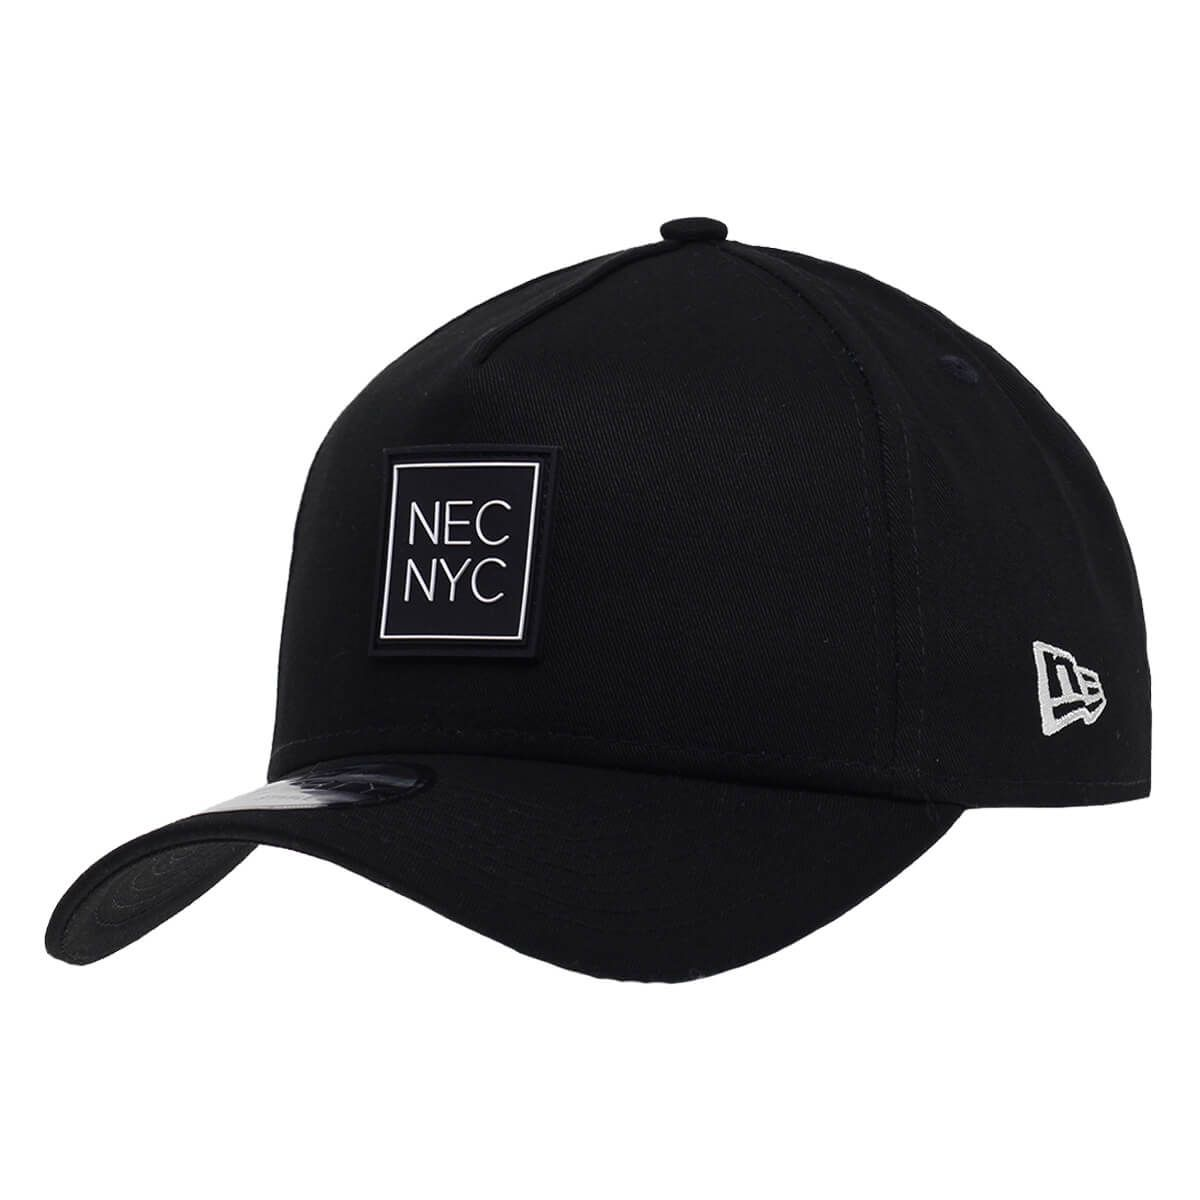 Boné New Era Aba Curva 940 SN Brand AF NEC NYC Rubber Preto